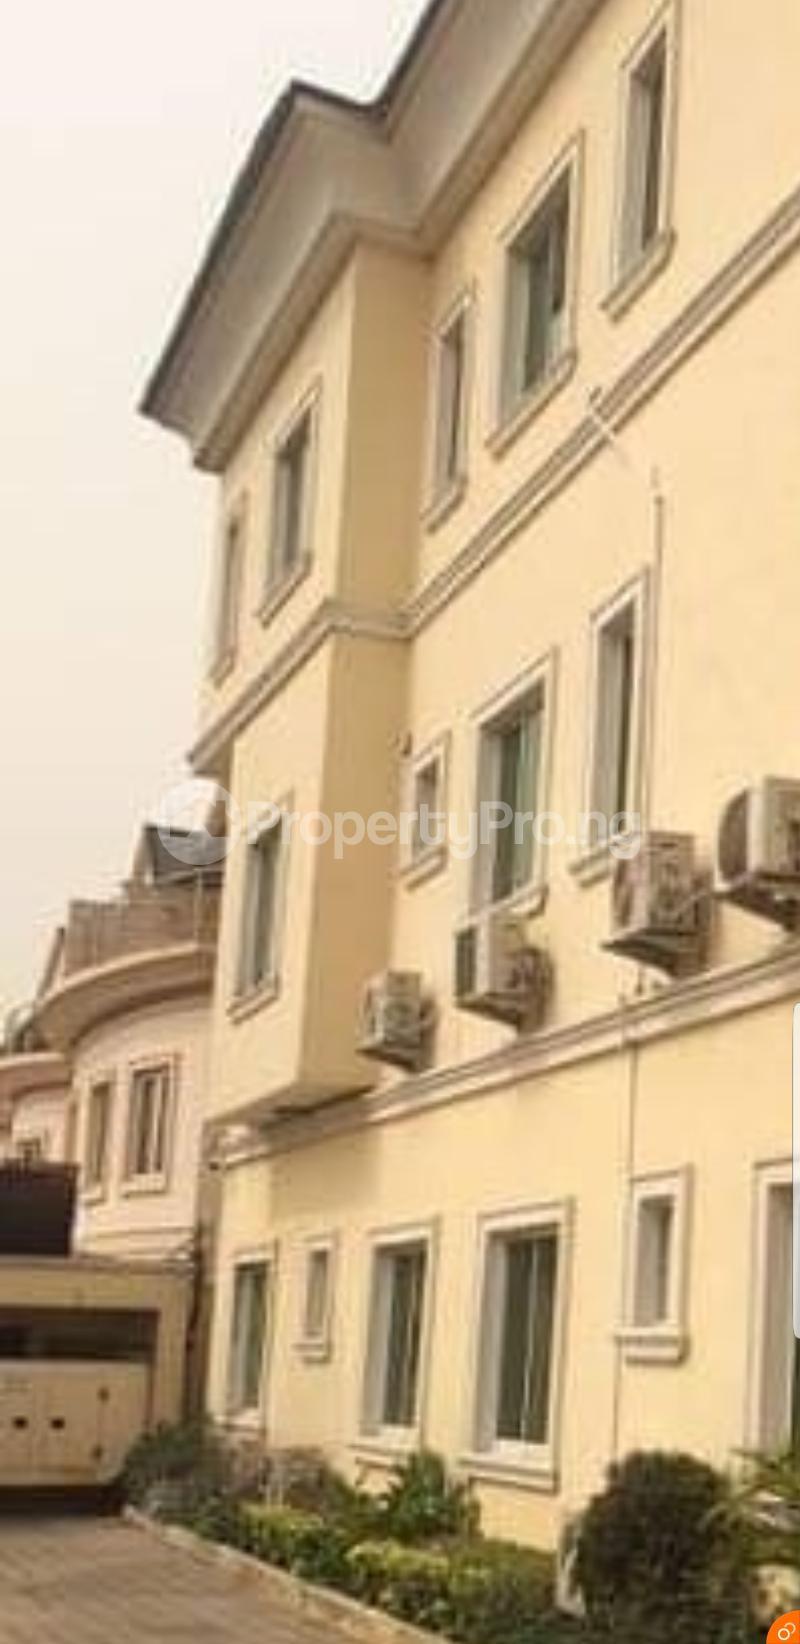 5 bedroom Semi Detached Duplex House for sale Olori Mojisola Onikoyi, Ikoyi, Lagos.  Mojisola Onikoyi Estate Ikoyi Lagos - 0